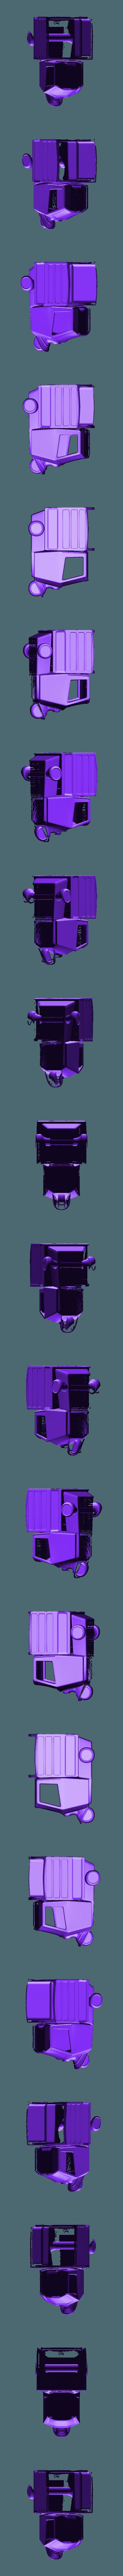 piaggioApe_mm_red_35_1.stl Download free STL file Belin che Ape! • Design to 3D print, thePixelsChips